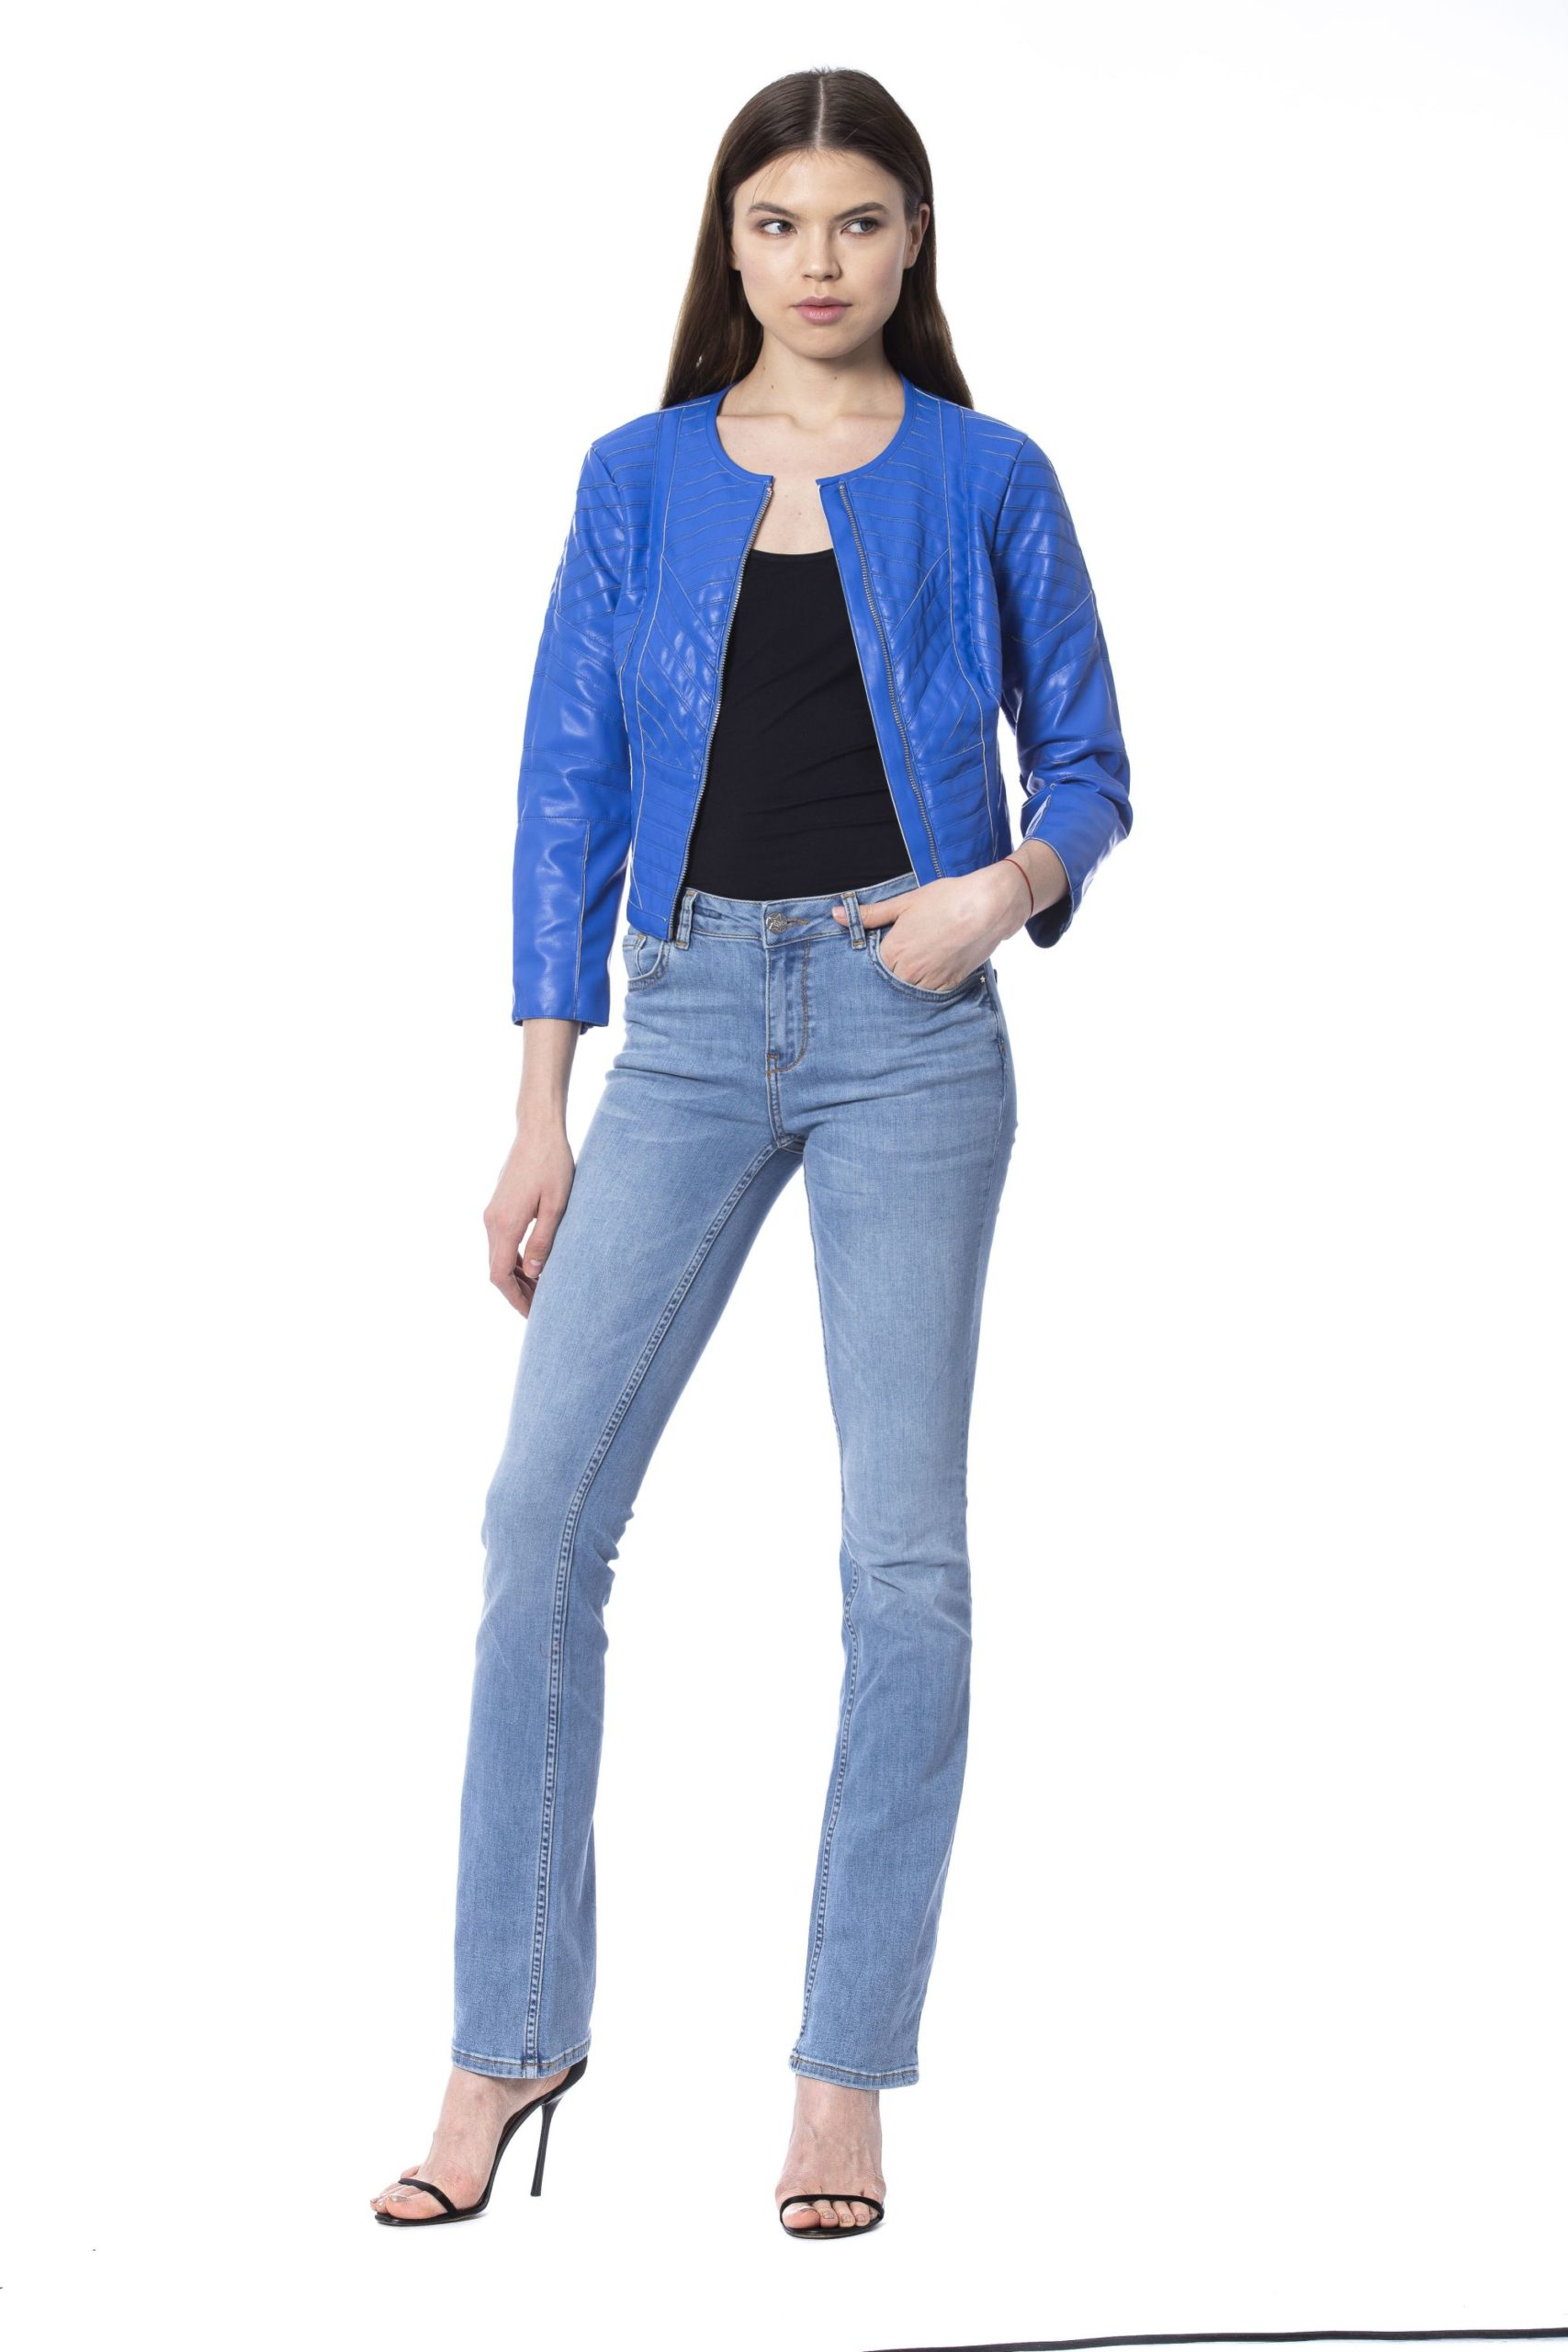 Silvian Heach Women's Jackets Blue SI993866 - XXS